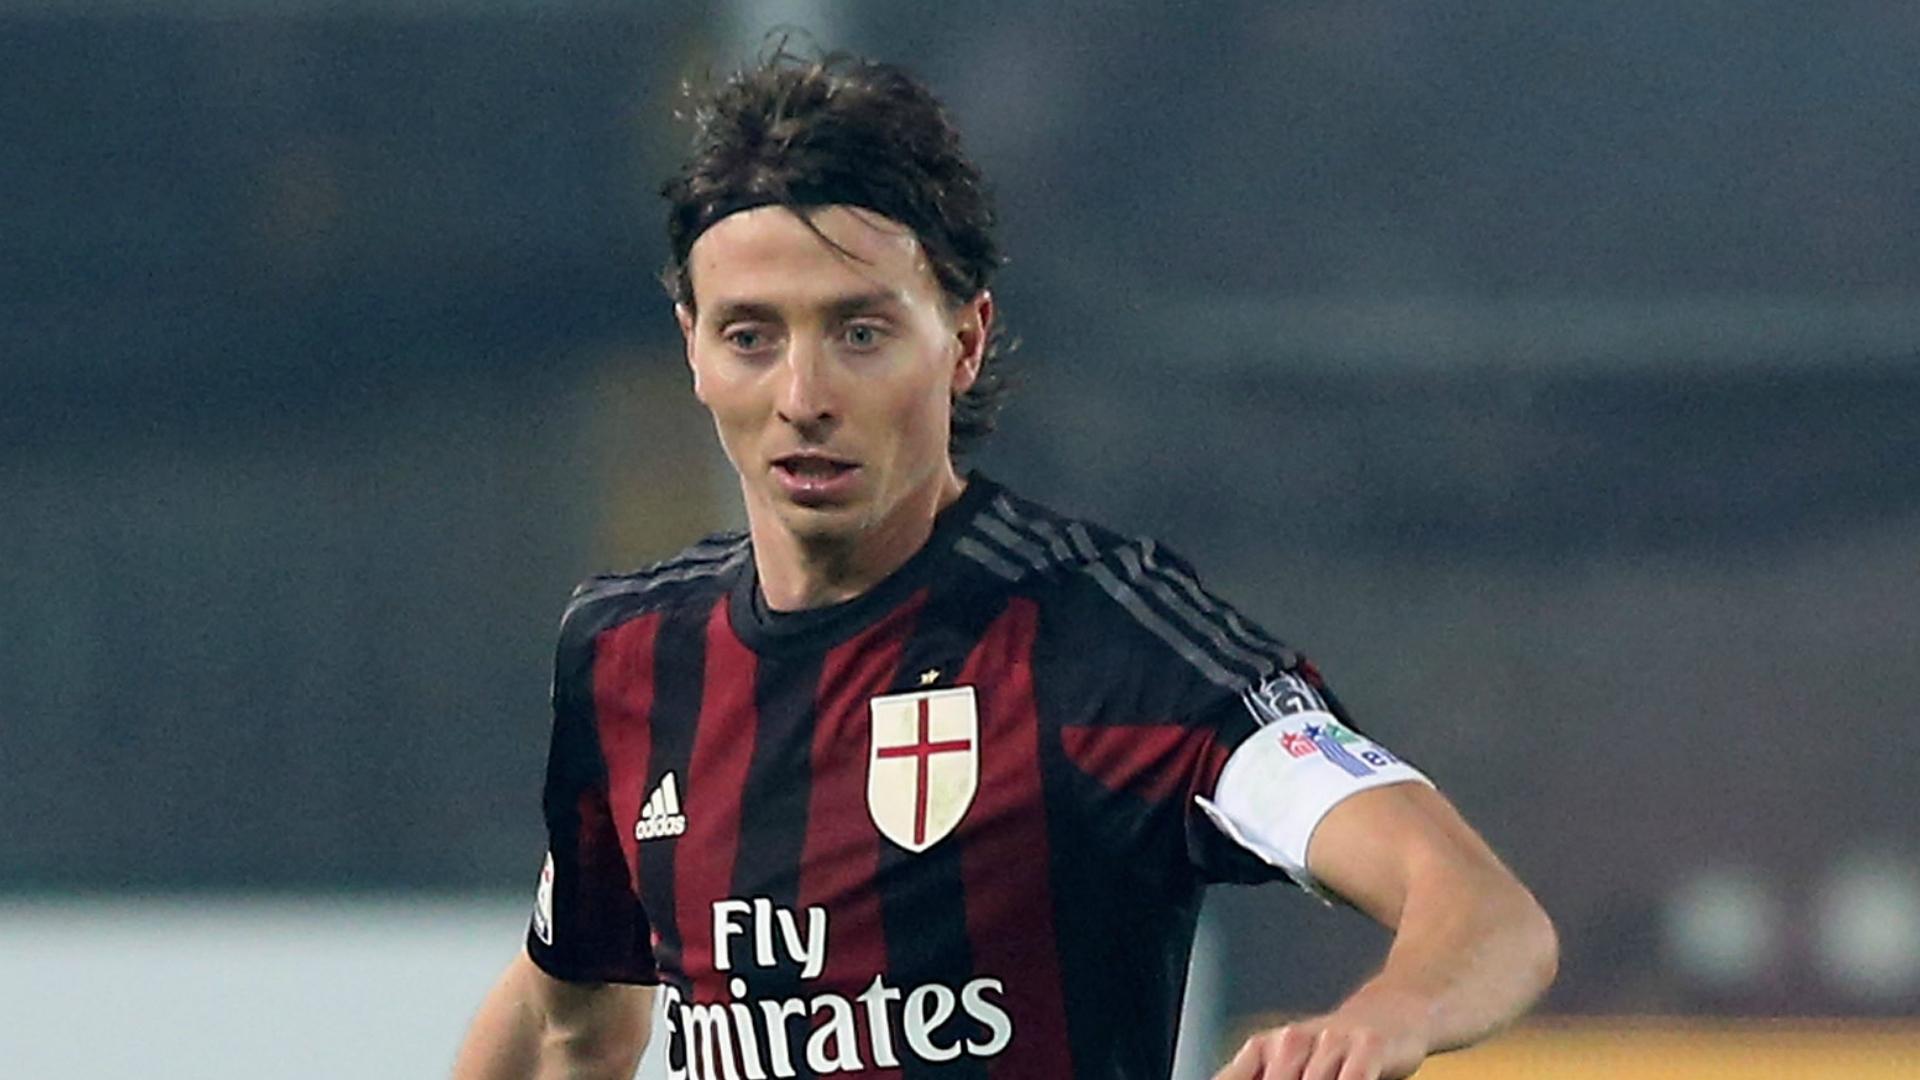 Coppa Italia: 2-1 al Carpi, Milan in semifinale